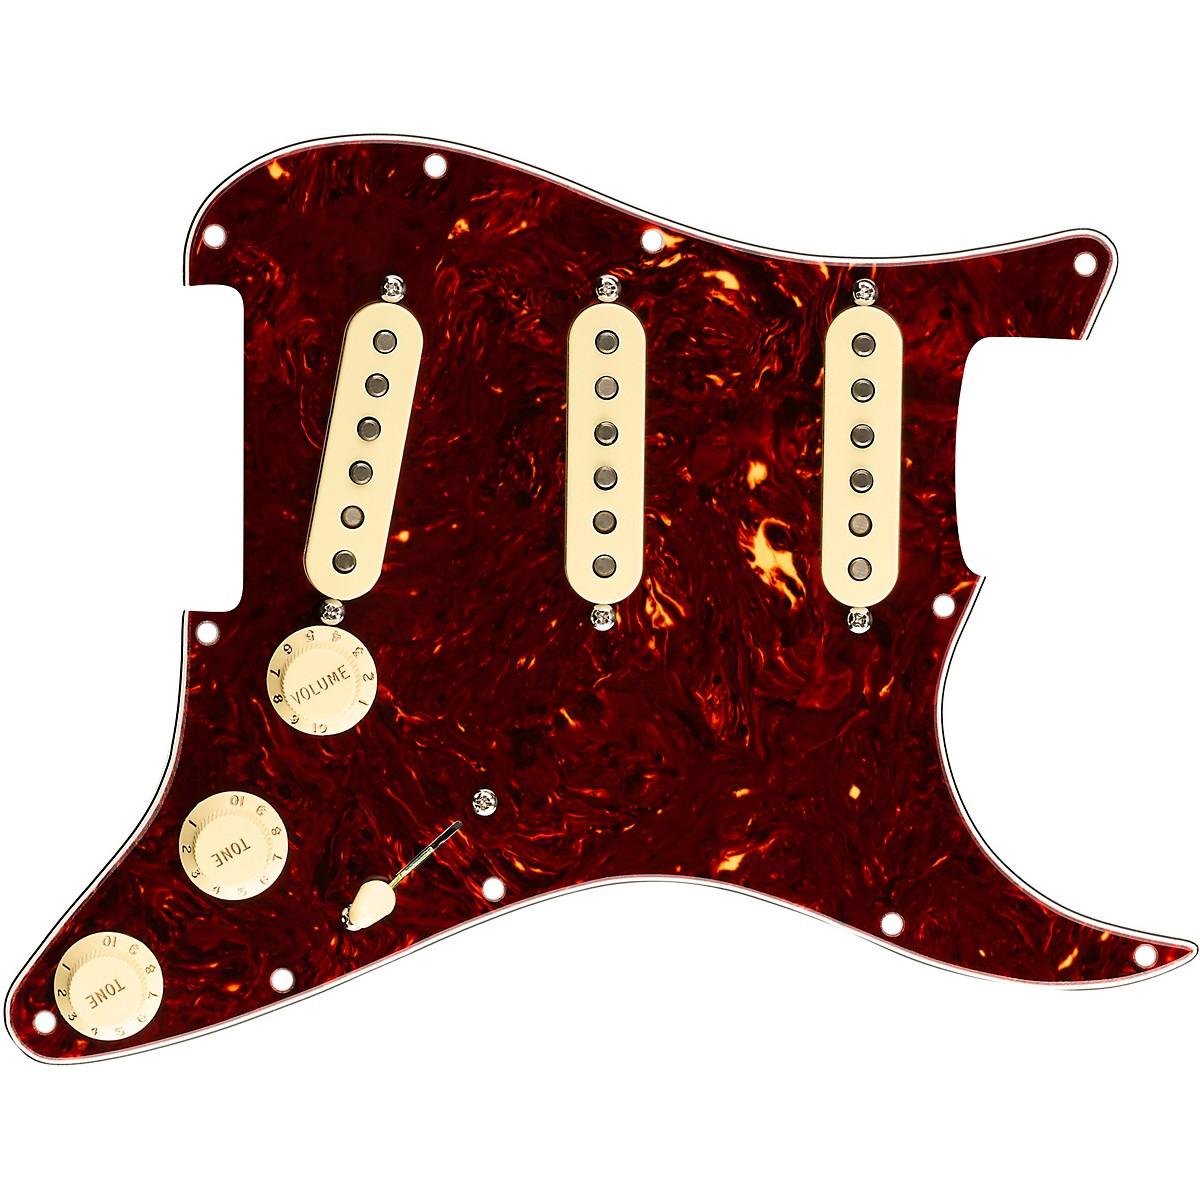 Fender Stratocaster SSS 57/62 Pre-Wired Pickguard